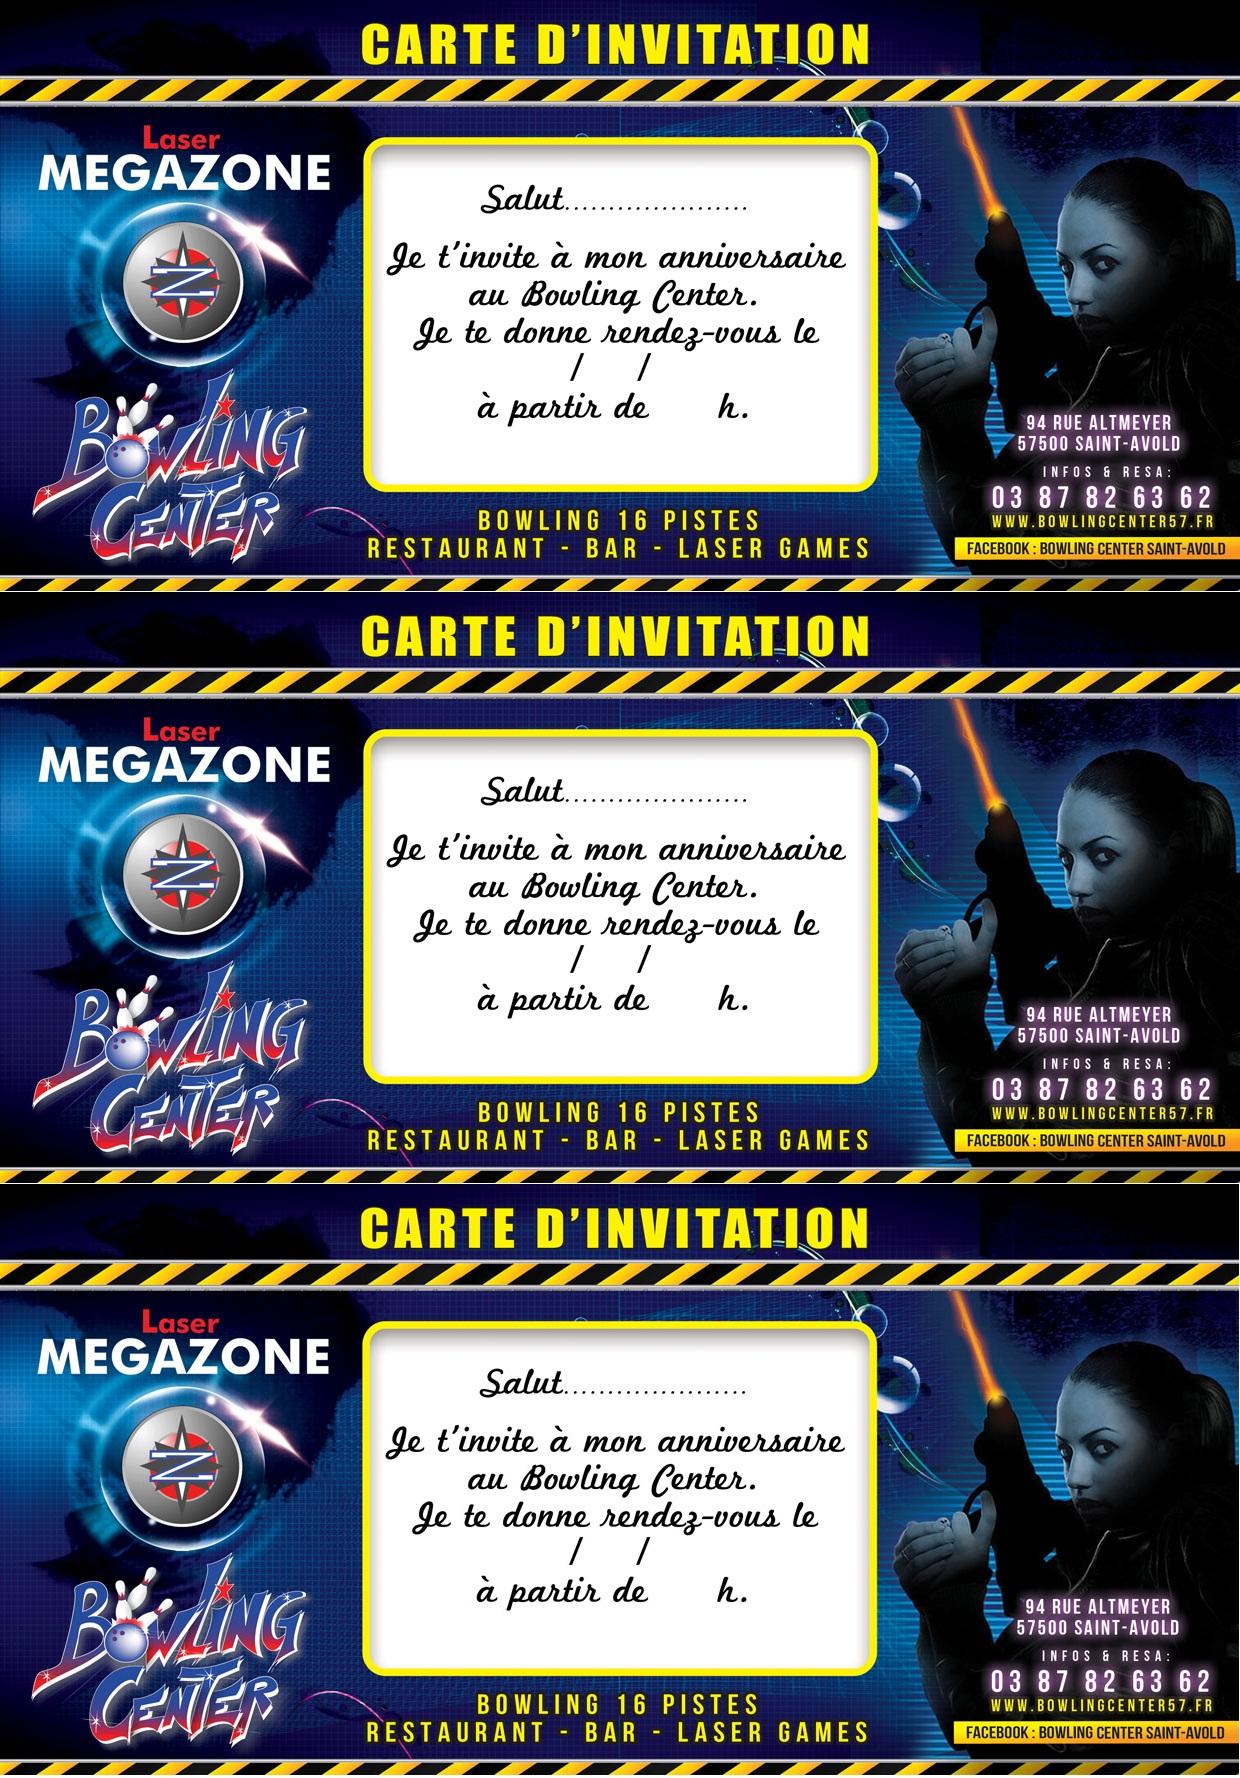 Bowling Center 57 - Saint-Avold - Bowling · Restaurant · Bar | CARTON INVITATION